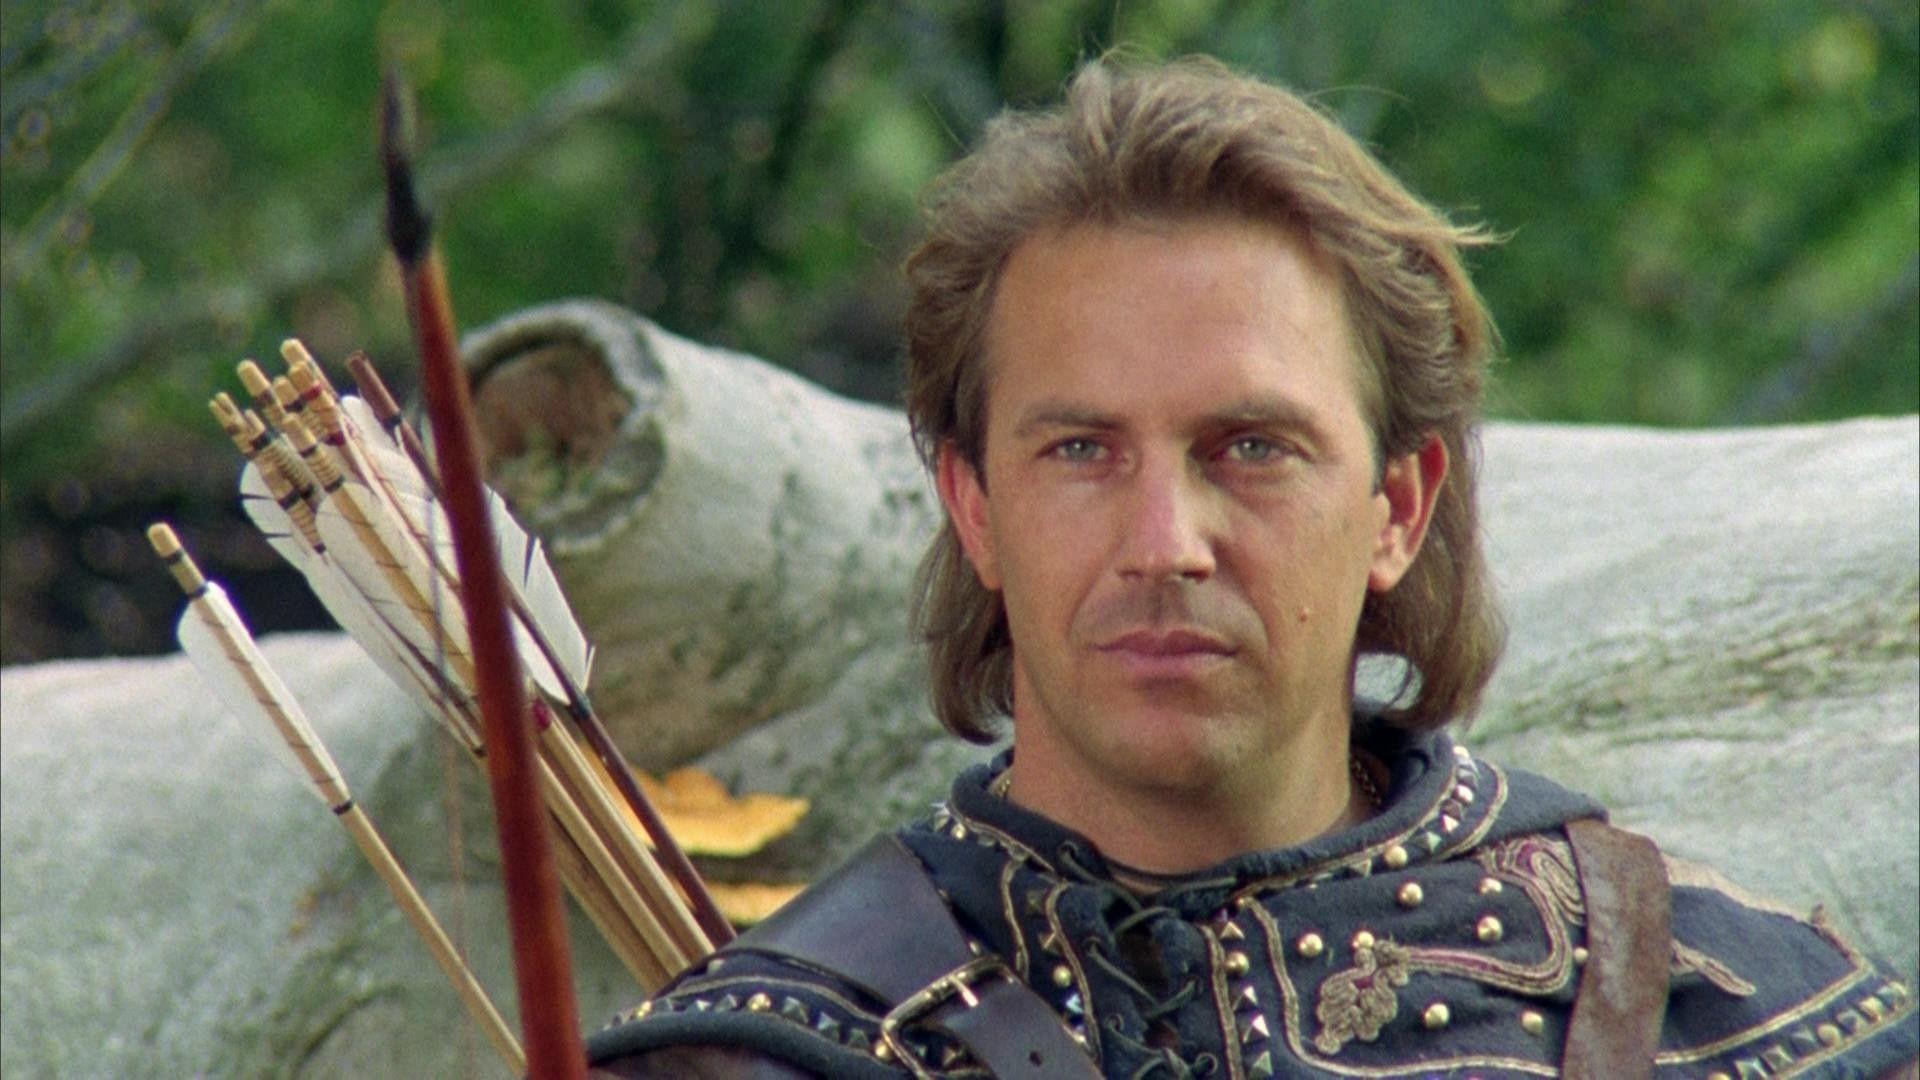 Robin Hood: Prince of Thieves film still